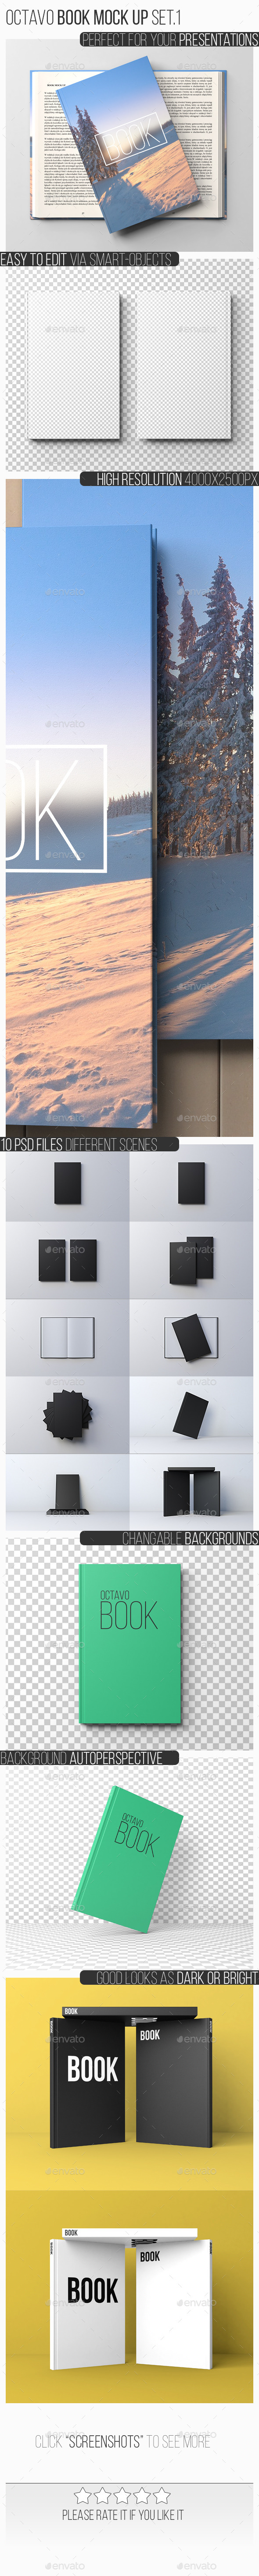 Octavo Book Mock-Up Set.1 - Books Print